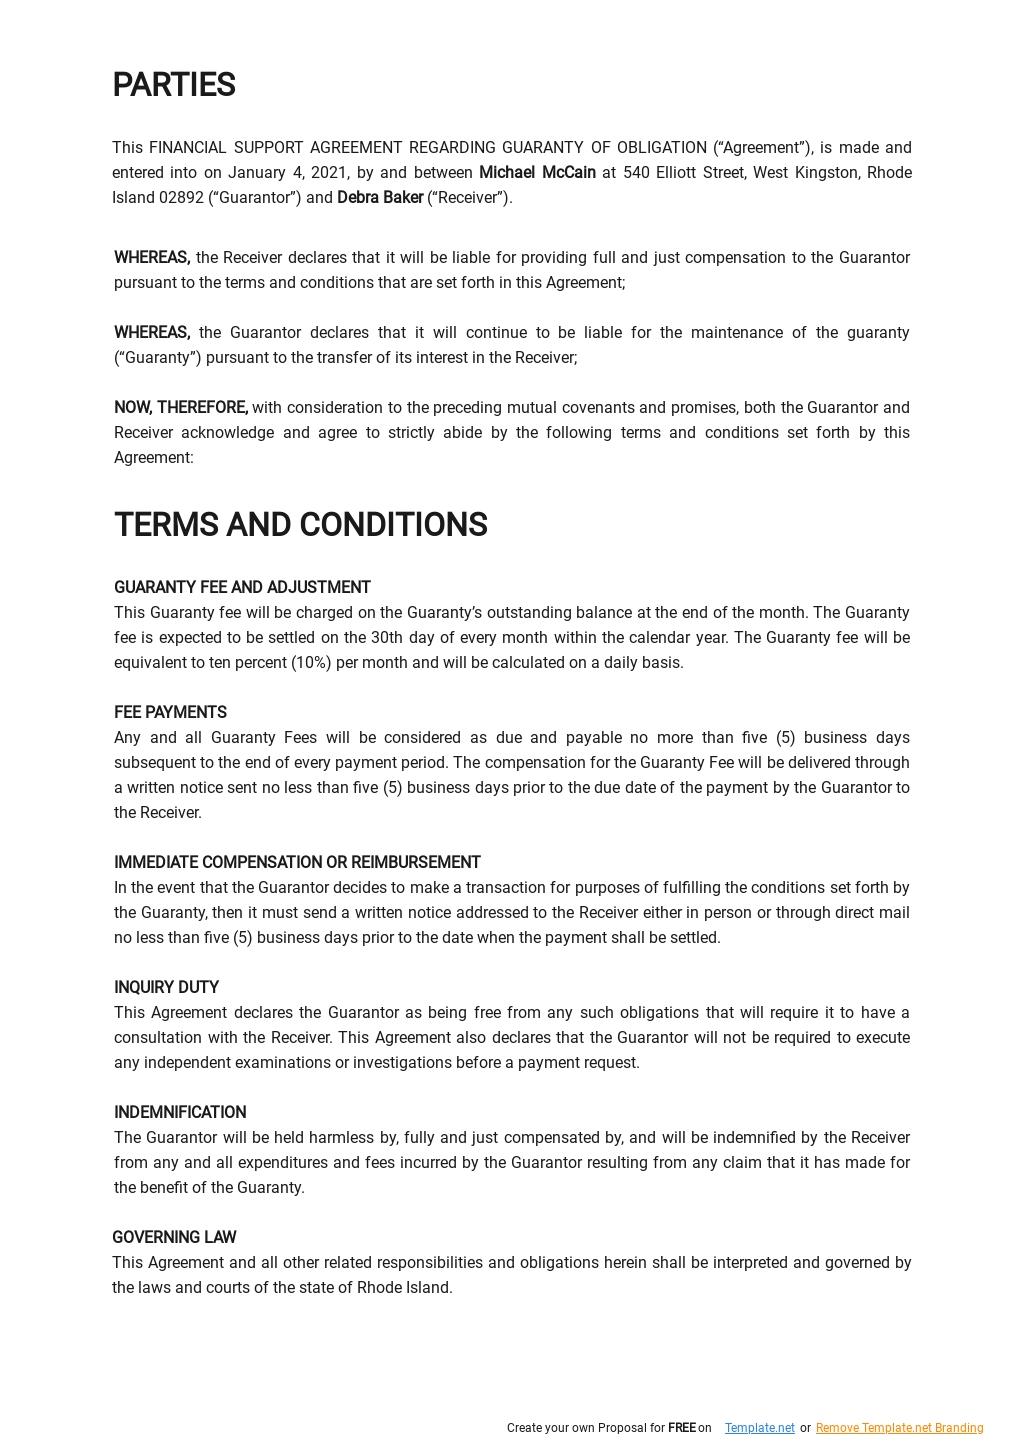 Financial Support Agreement Regarding Guaranty of Obligation Template 1.jpe